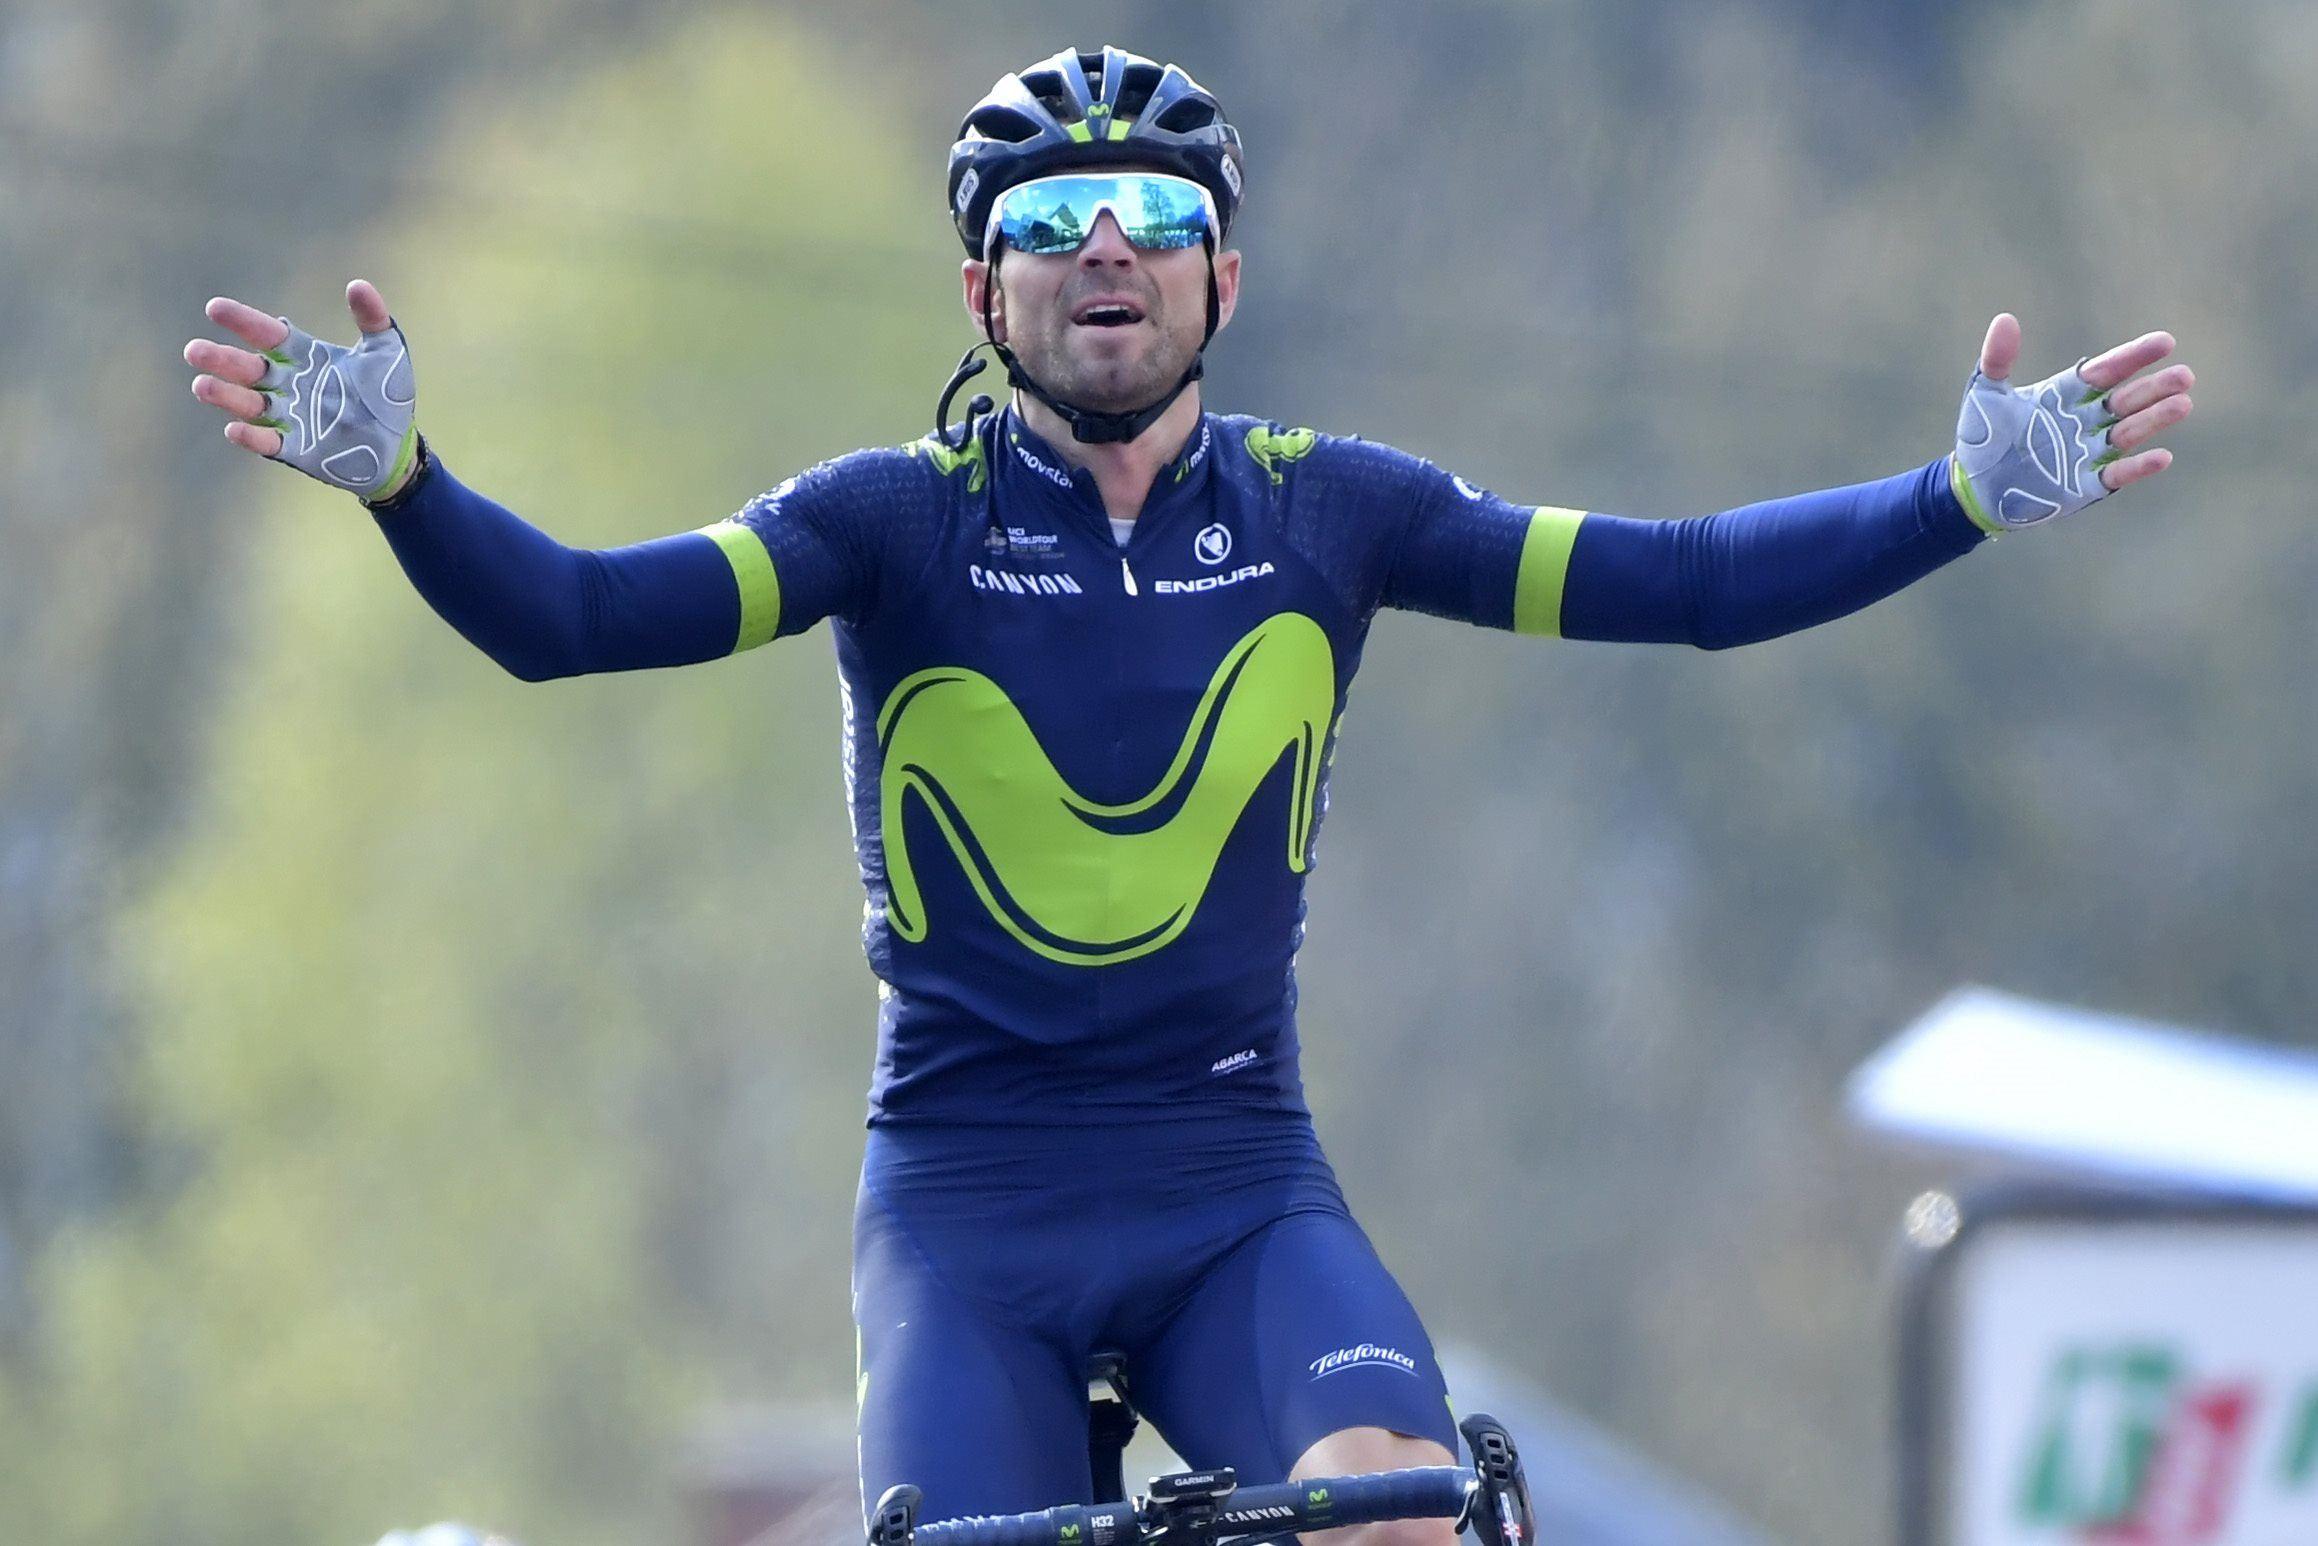 Cyclisme - Valverde s'offre Liège-Bastogne-Liège en pensant à Scarponi